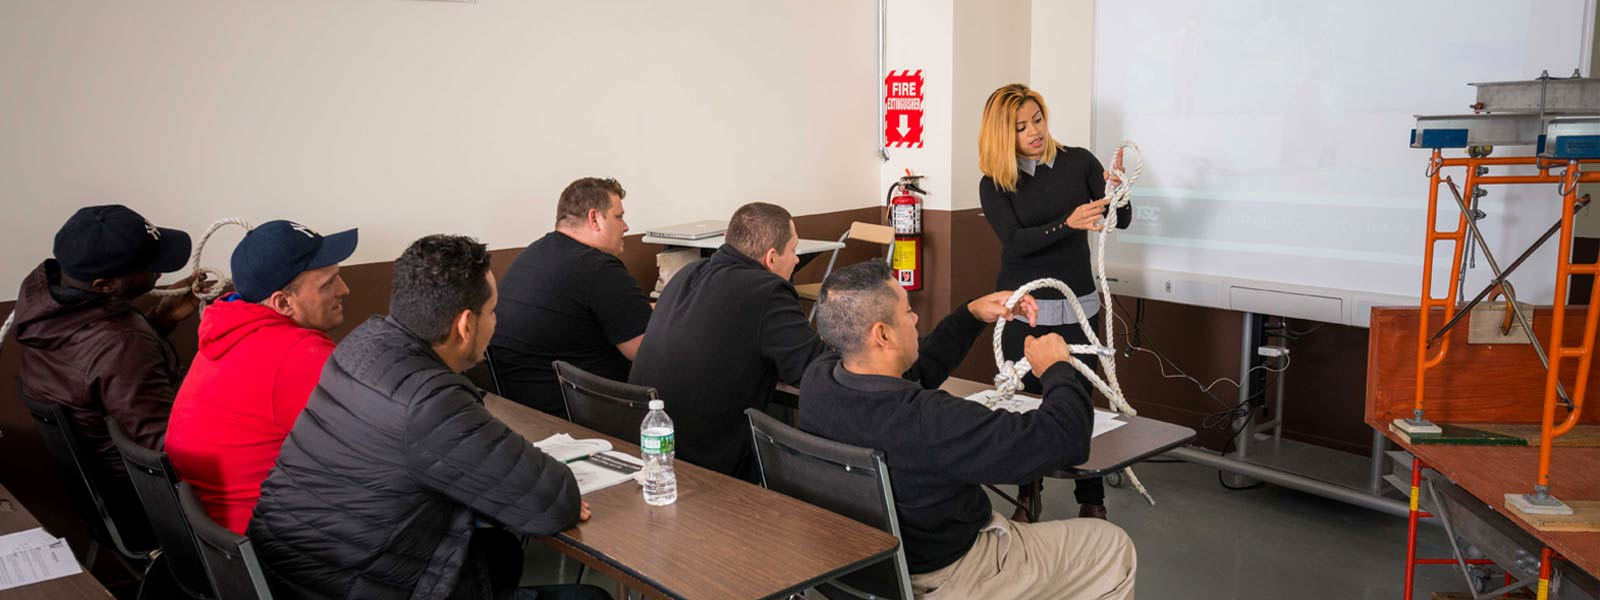 TSC-Training-Academy-Classroom